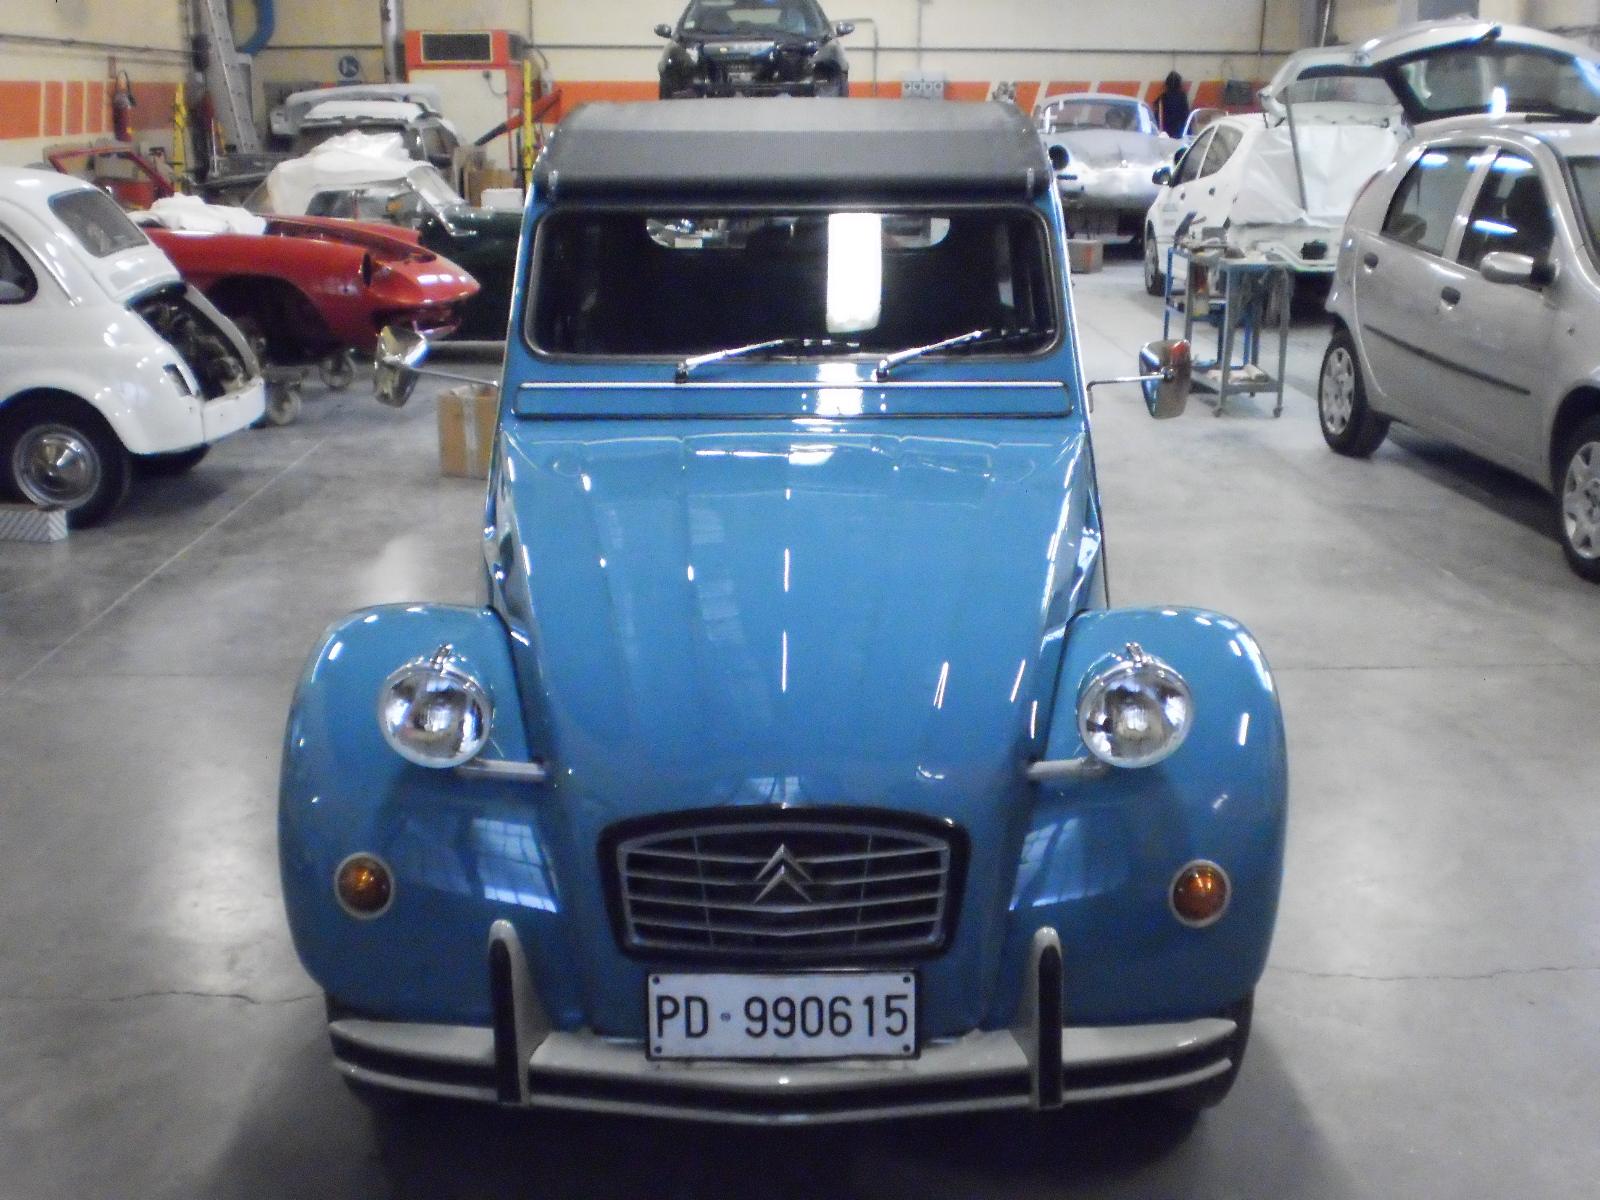 restauro auto d'epoca carrozzeria brescia 2 cv